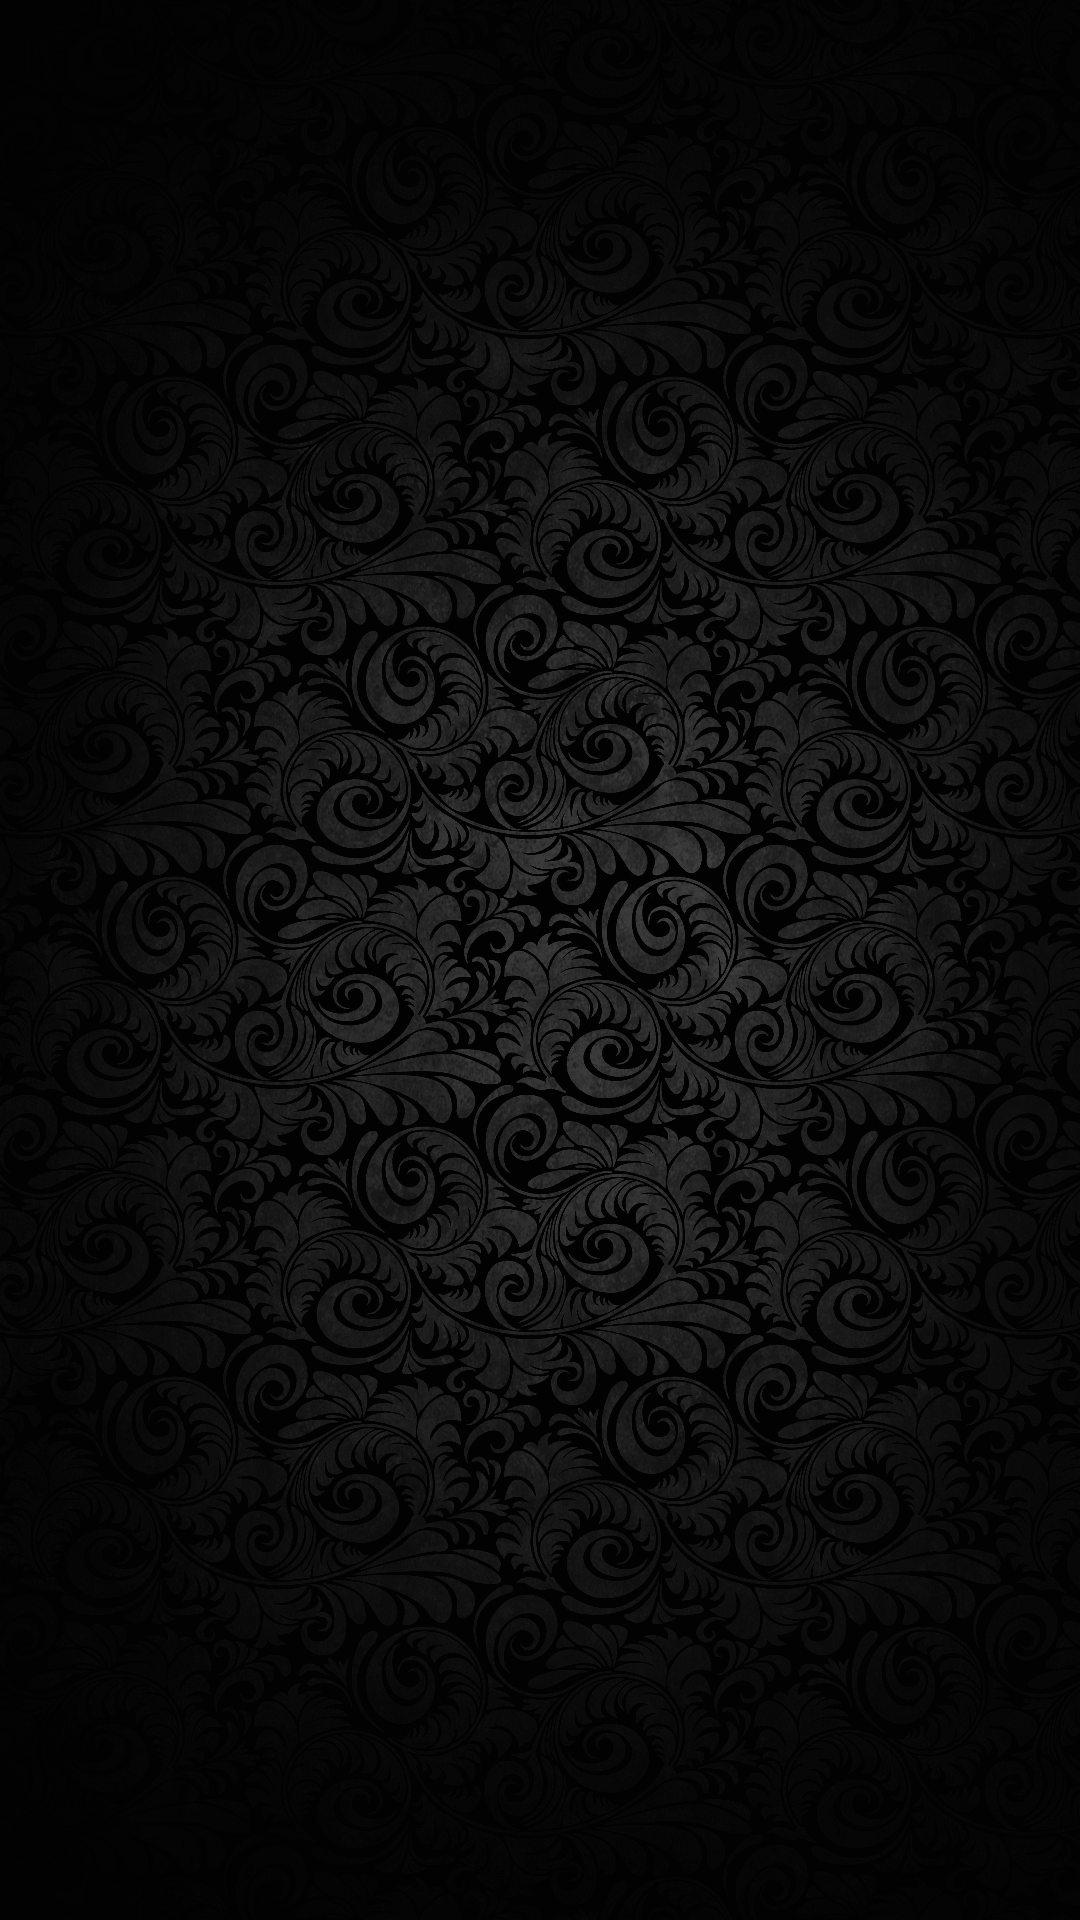 Hd wallpaper for smartphone - Theme Full Hd 1080 X 1920 Smatphone Htc